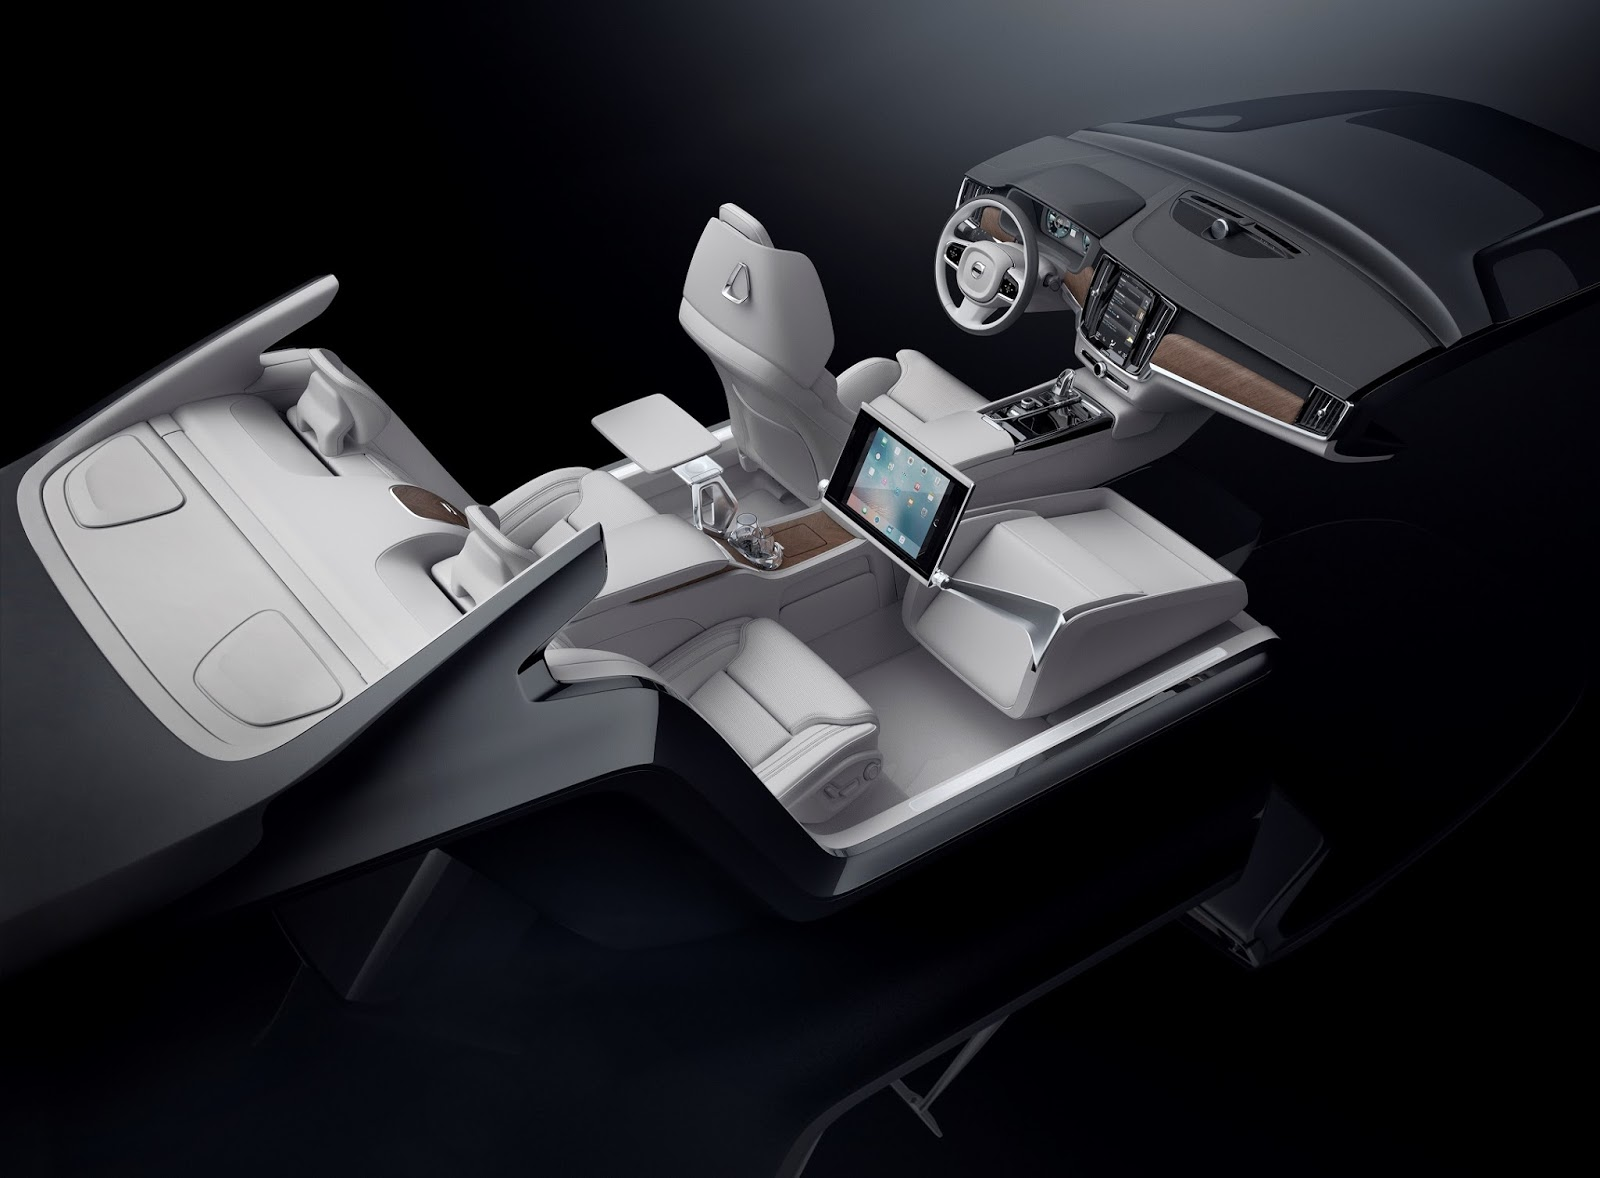 VOLVO2BS902BEXCELLENCE2BCONCEPT 3 Το Νέο Volvo S90 ήταν ο μεγάλος guest star στο συνέδριο ηγεσίας της ΕΑΣΕ Luxury, Luxury sedan, sedan, Volvo, Volvo S90